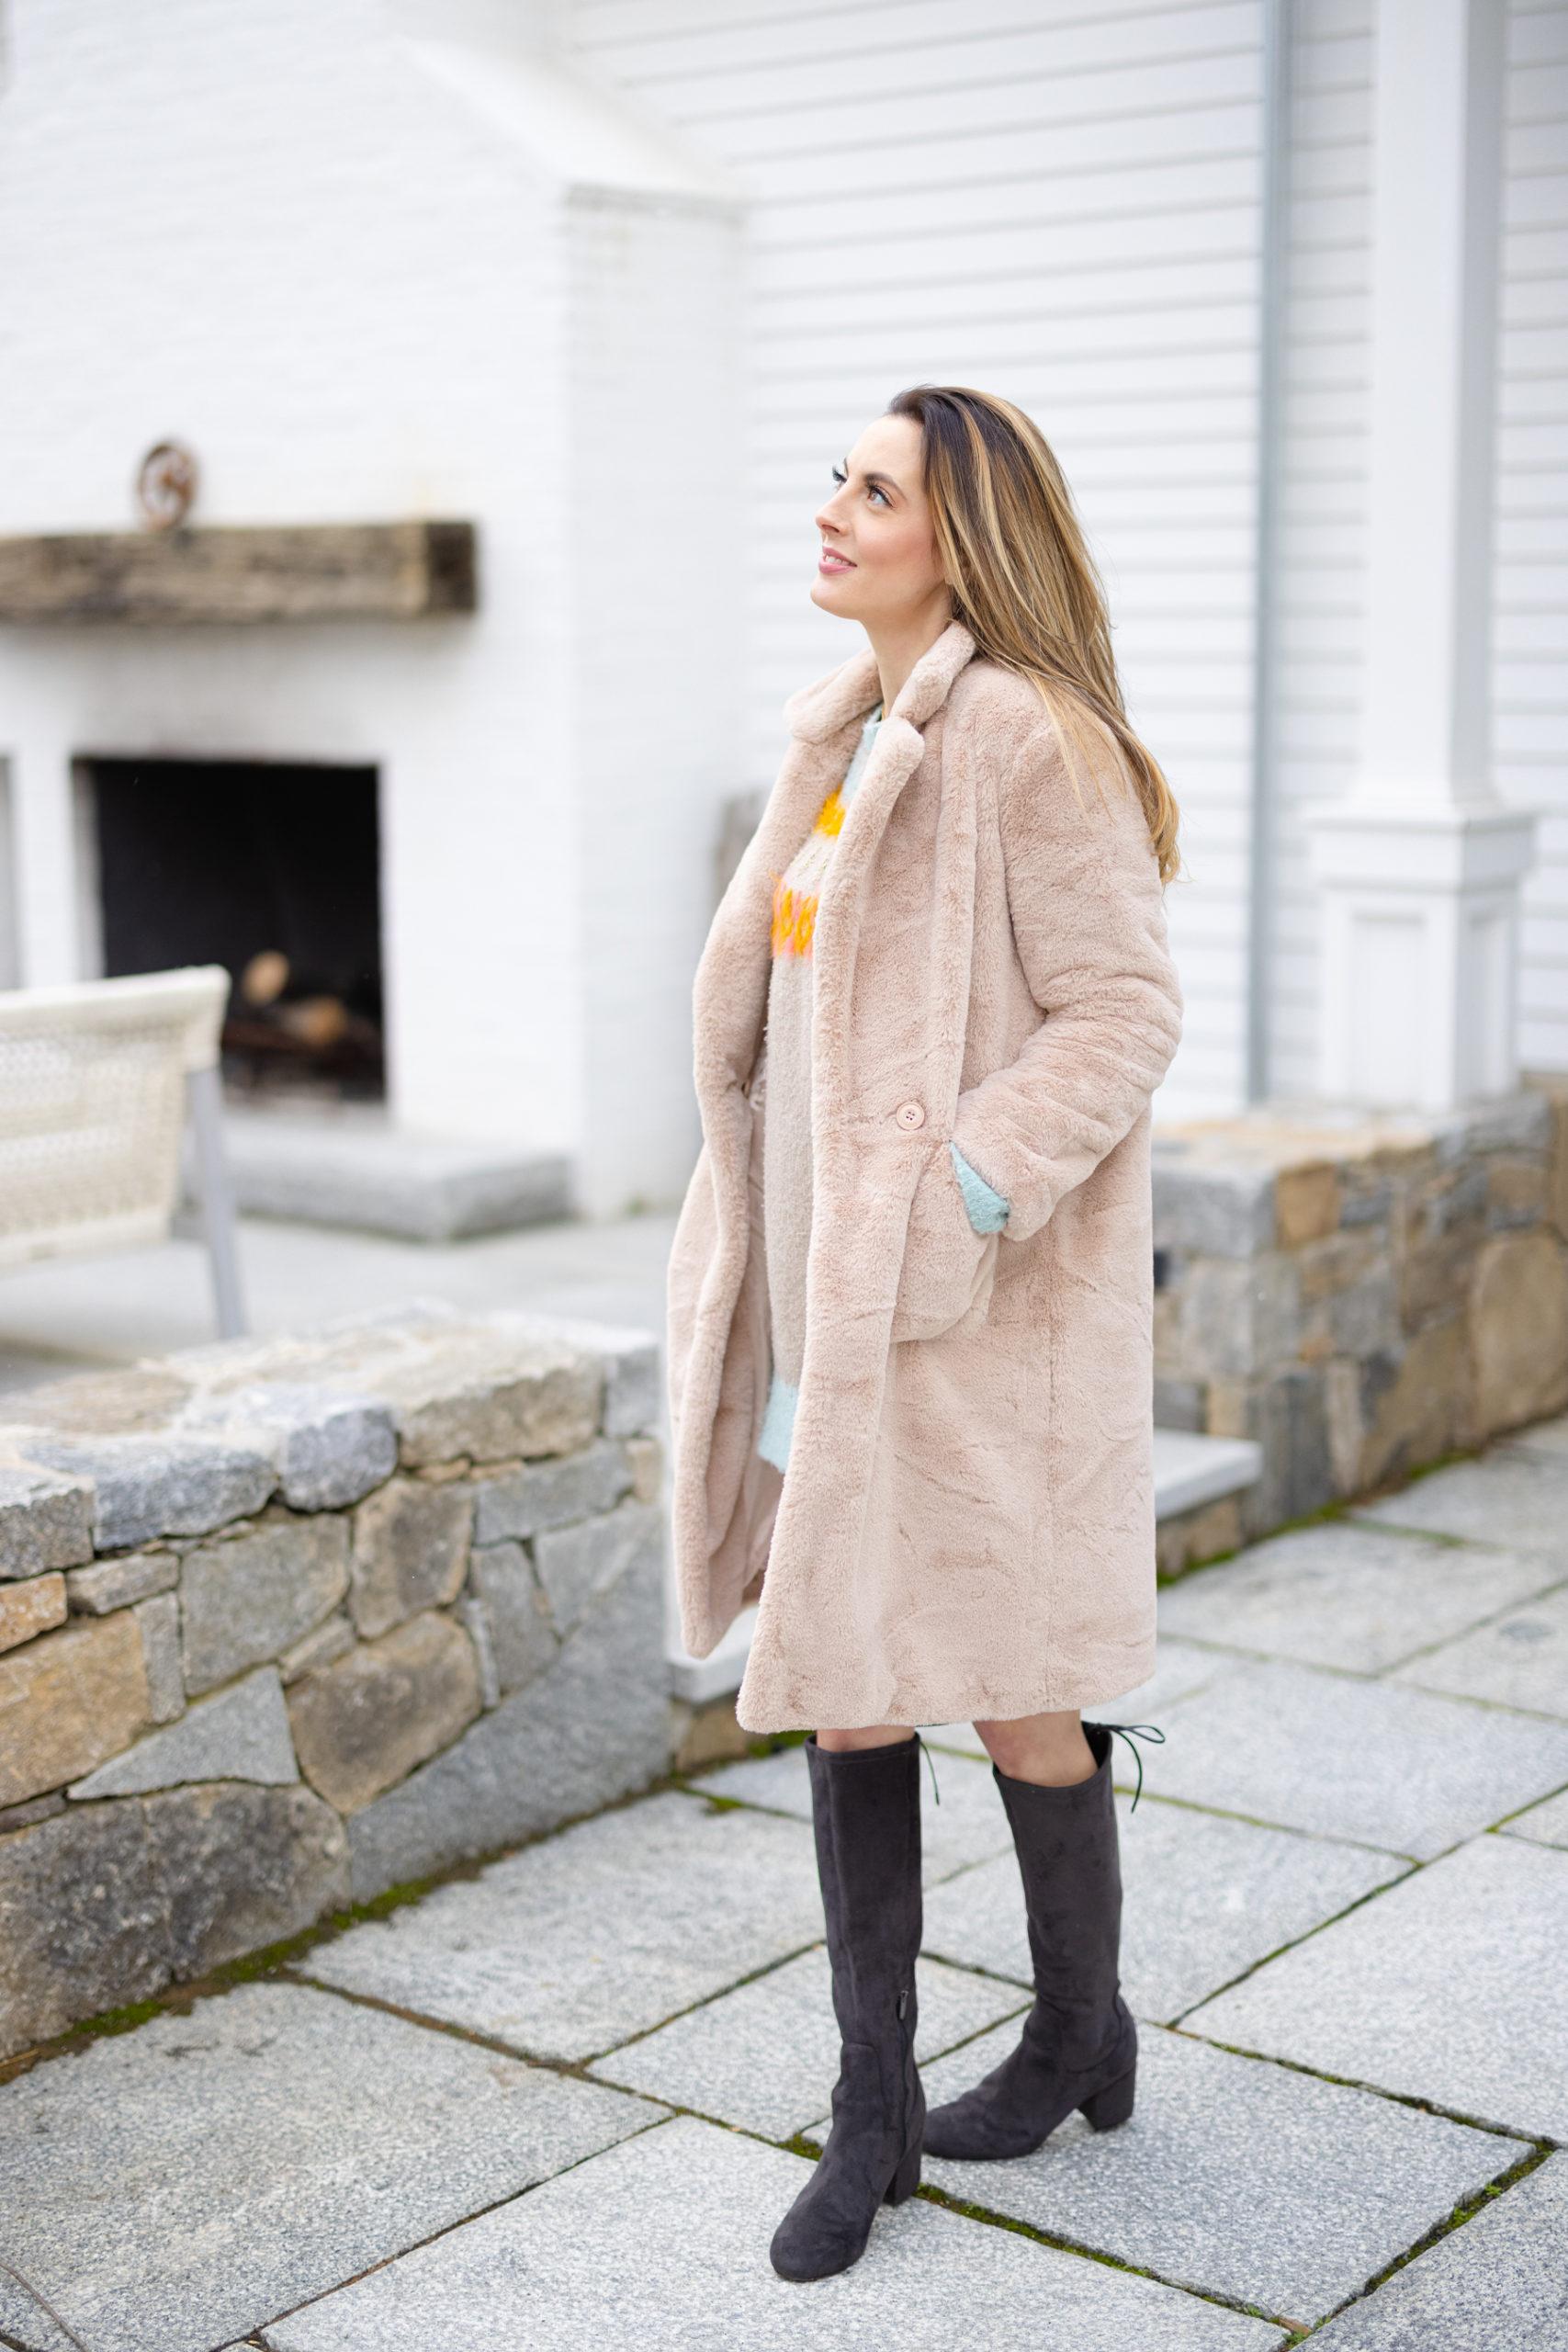 Eva Amurri shares what she'd tell her younger self